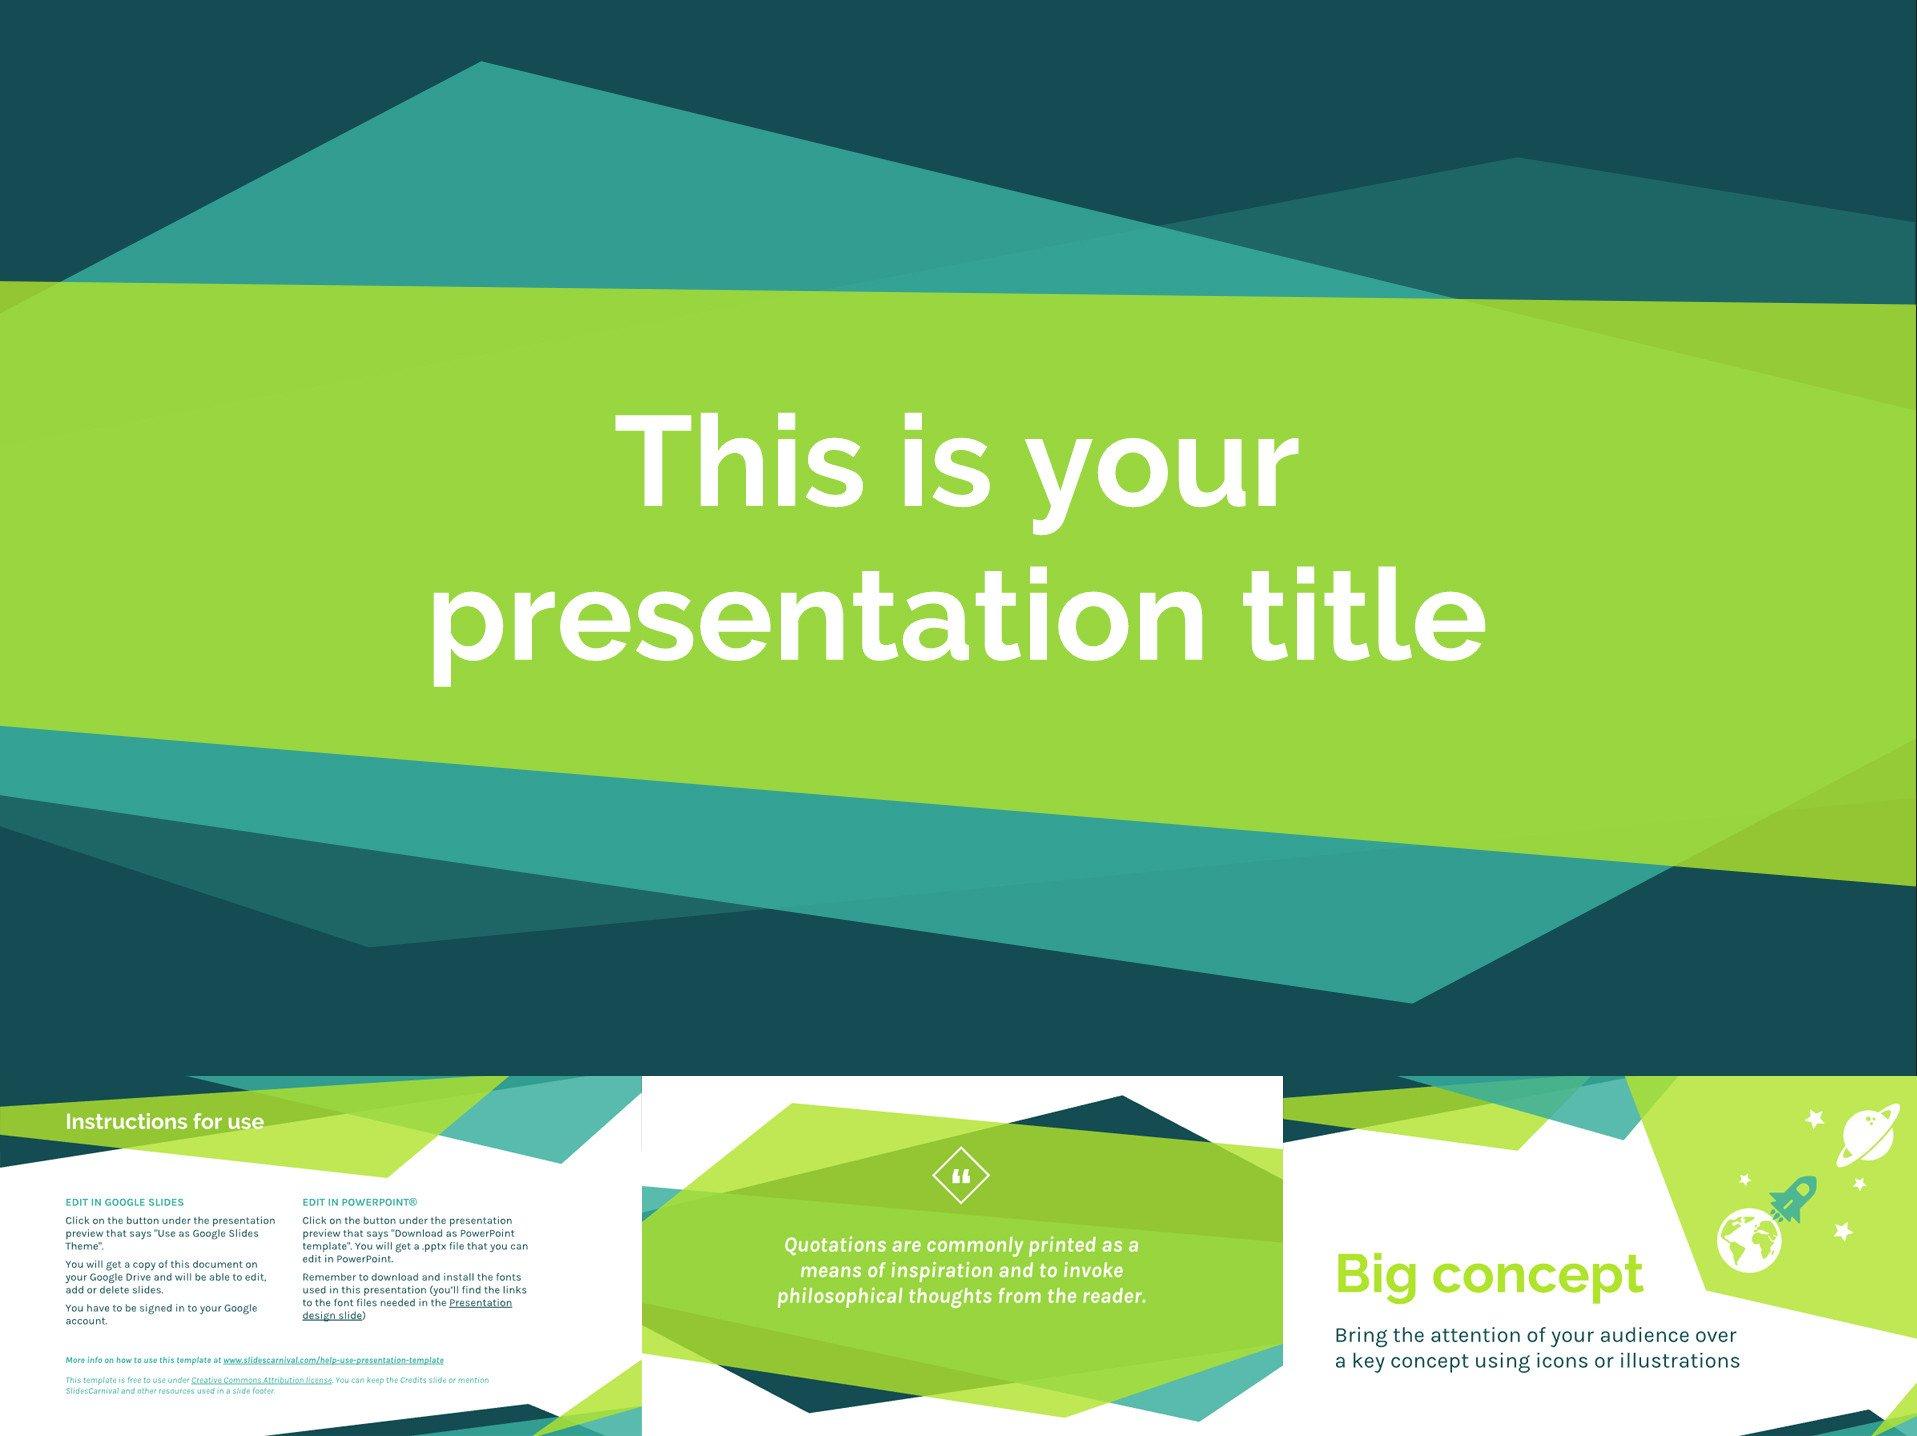 Google Docs Powerpoint Templates 30 Free Google Slides Templates for Your Next Presentation